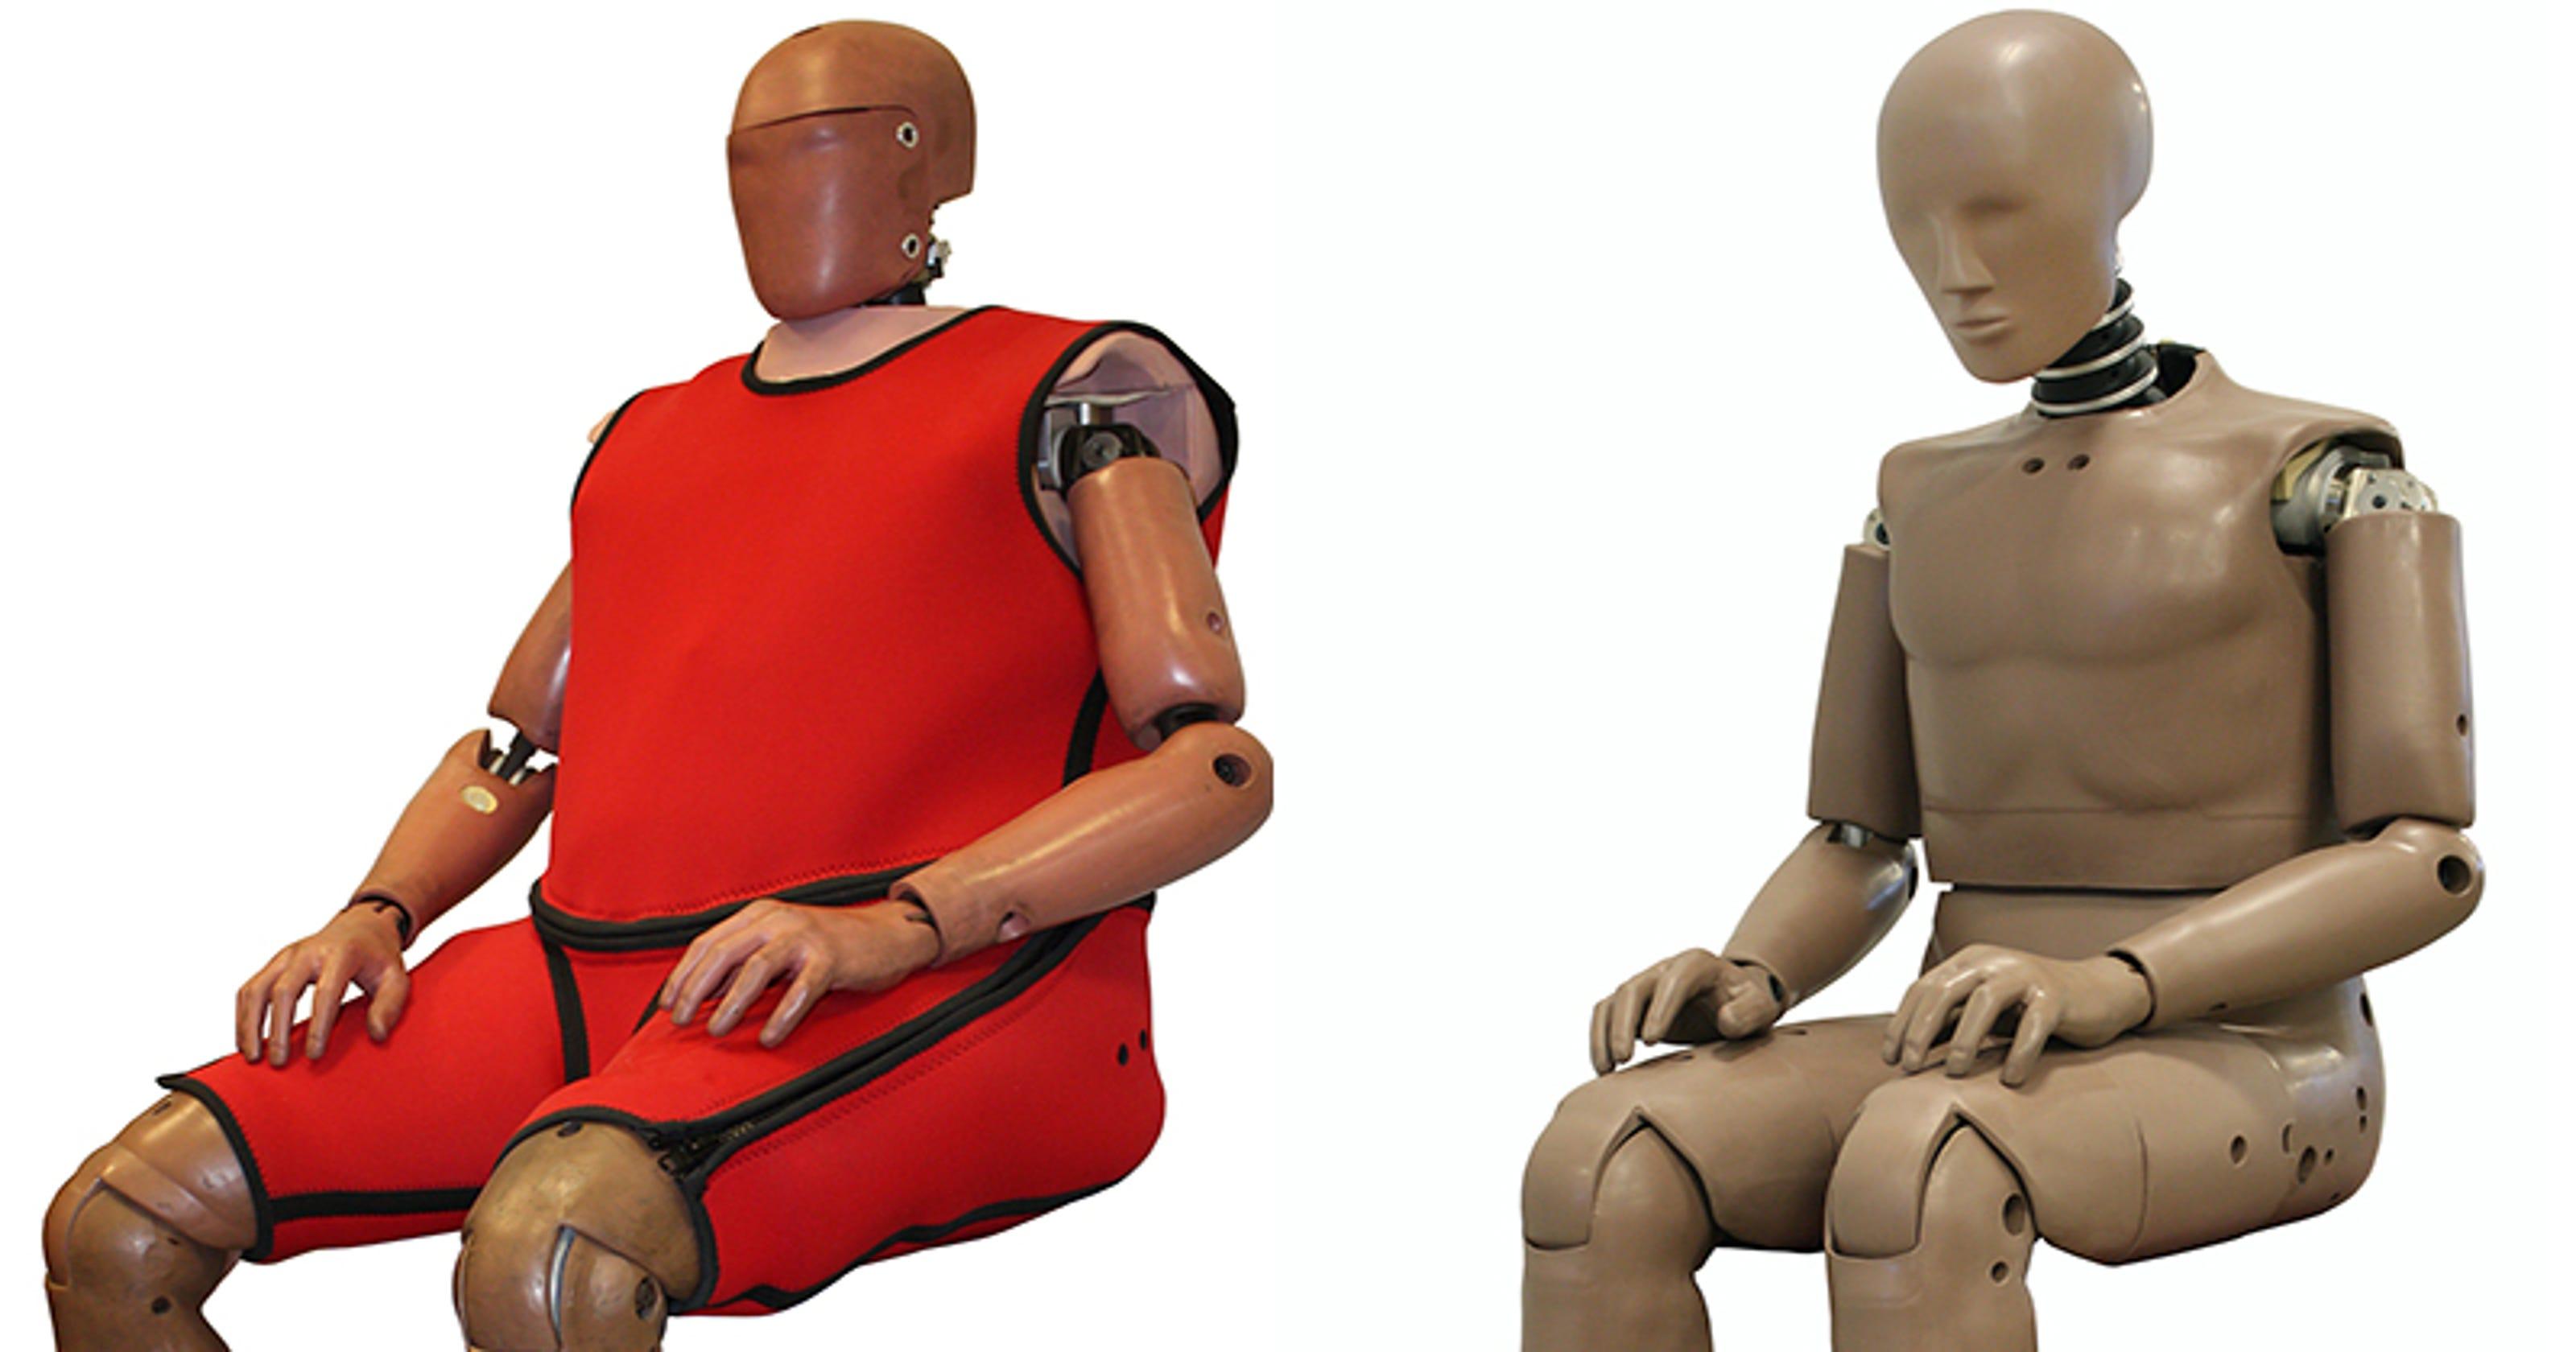 Michigan Based Firm Unveils Obese Crash Test Dummy